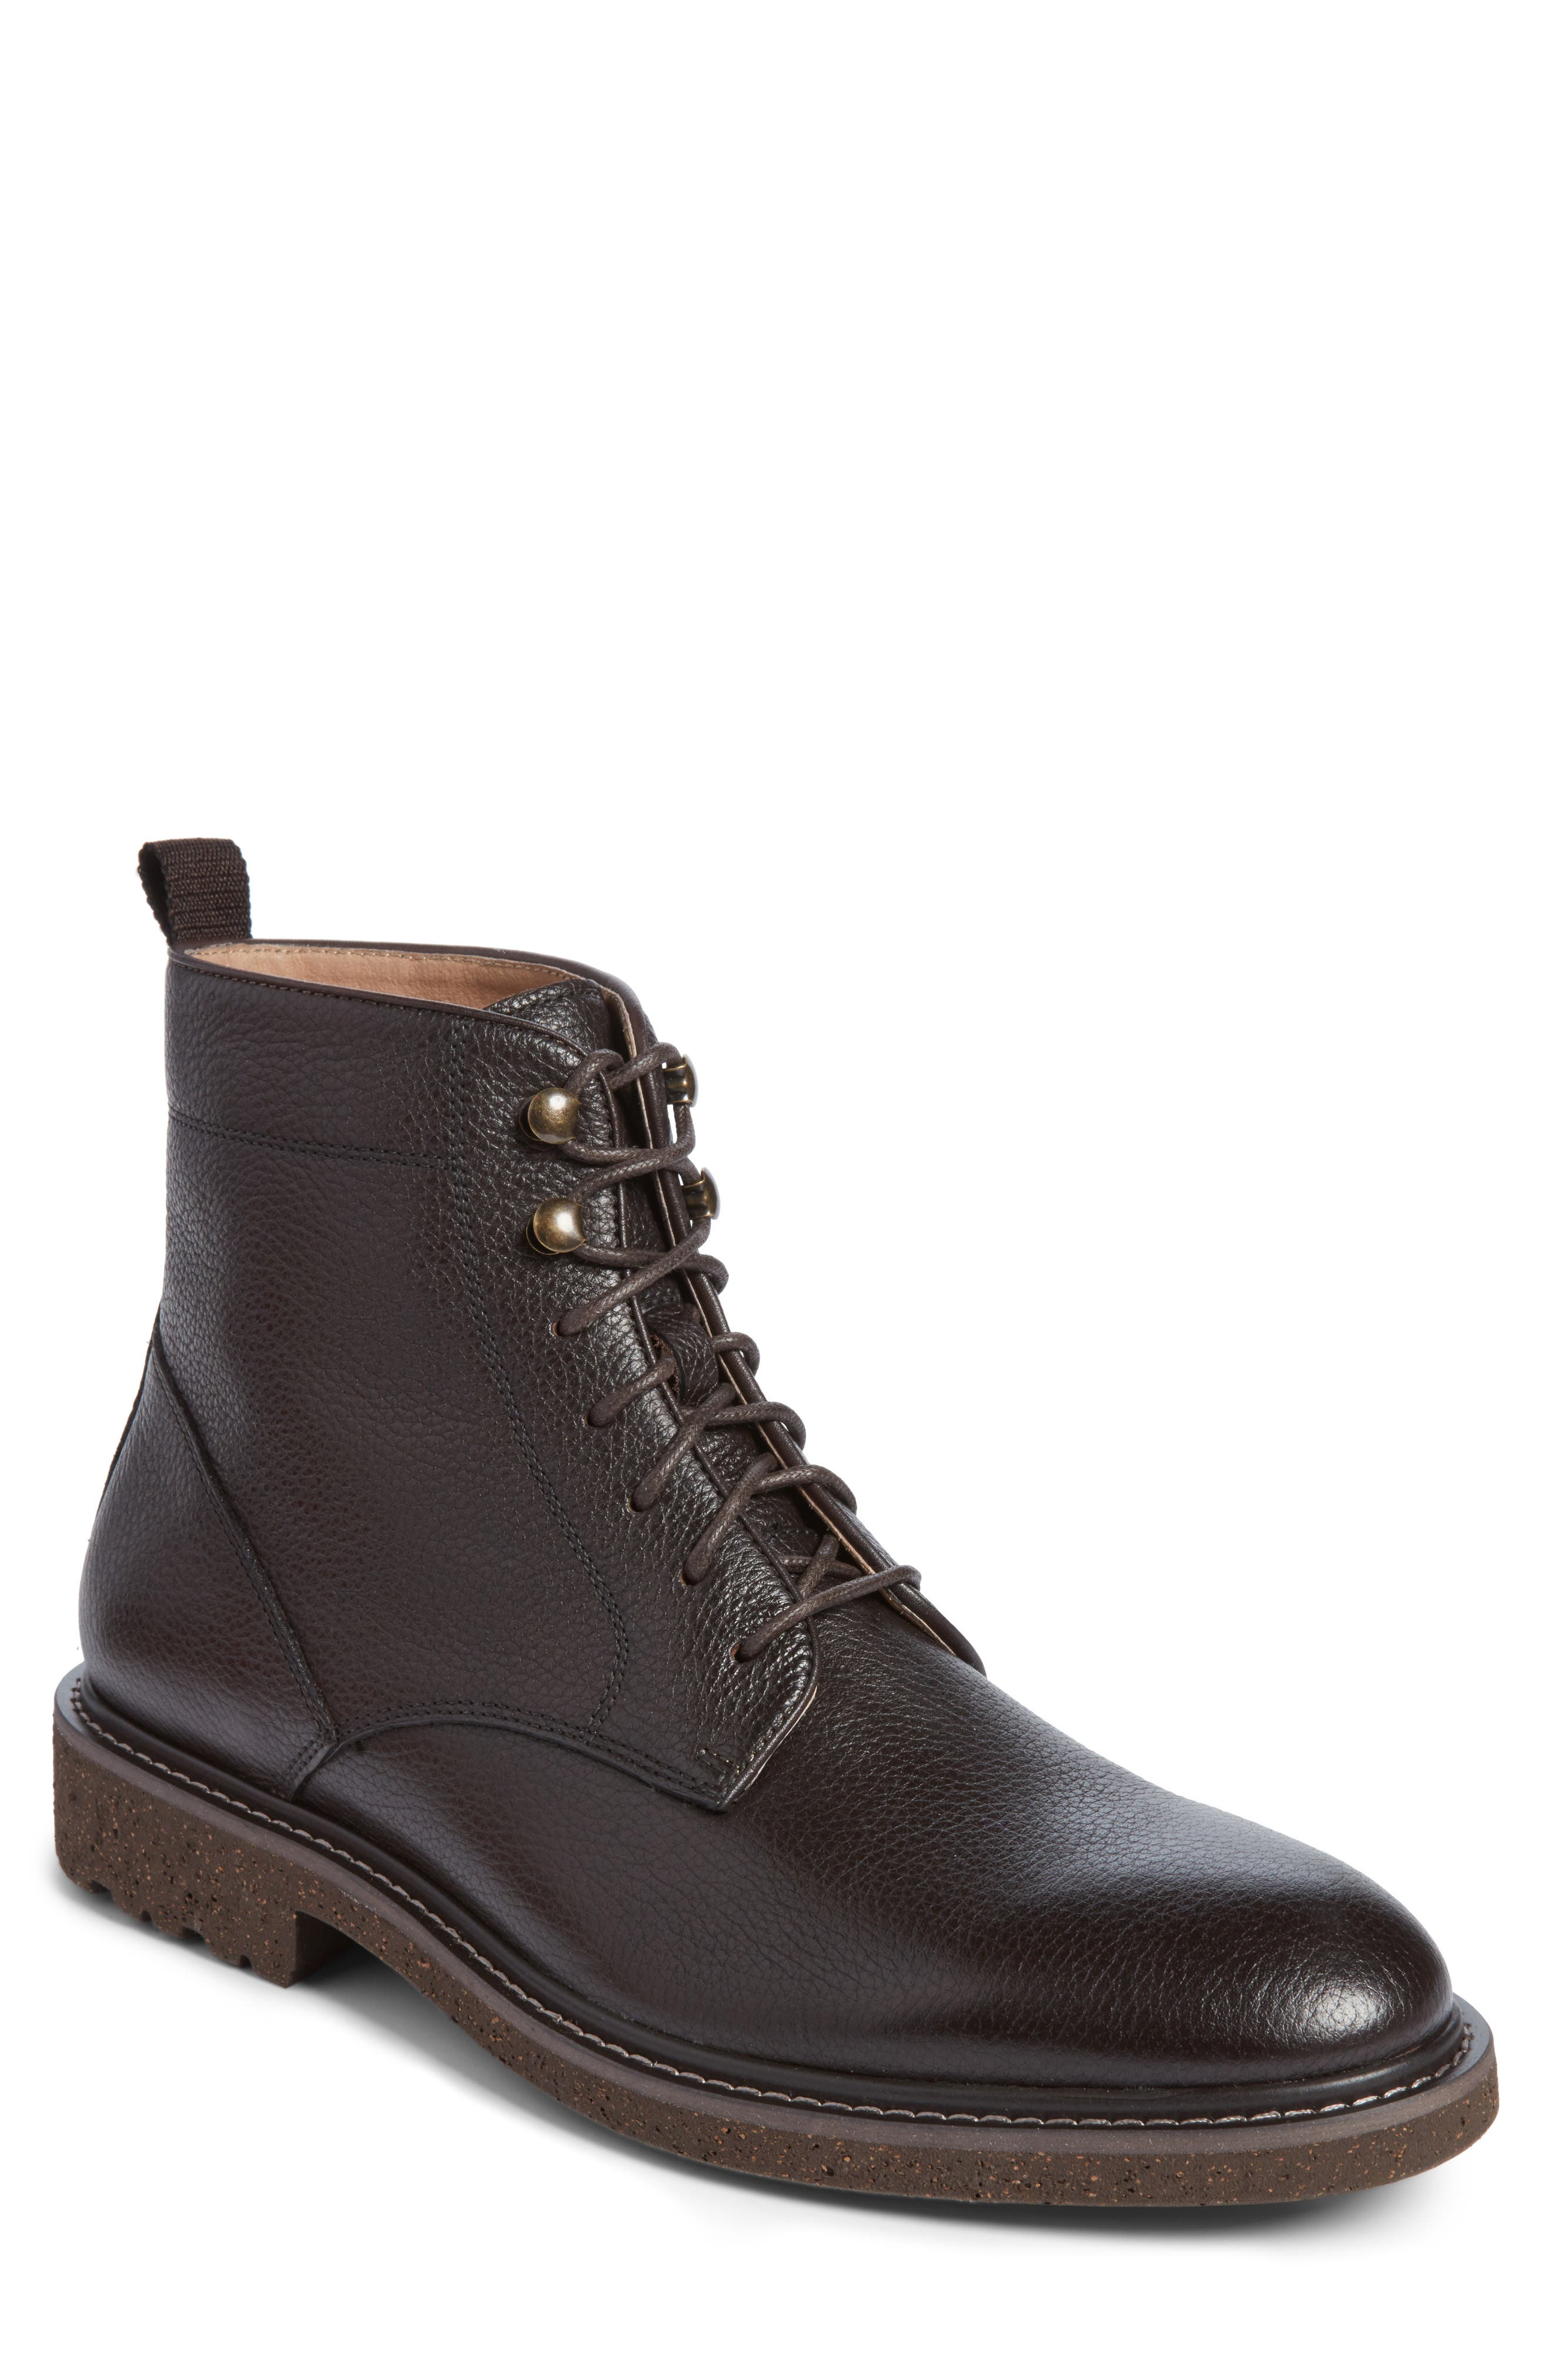 Trenton Plain Toe Boot,                         Main,                         color, Chocolate Leather